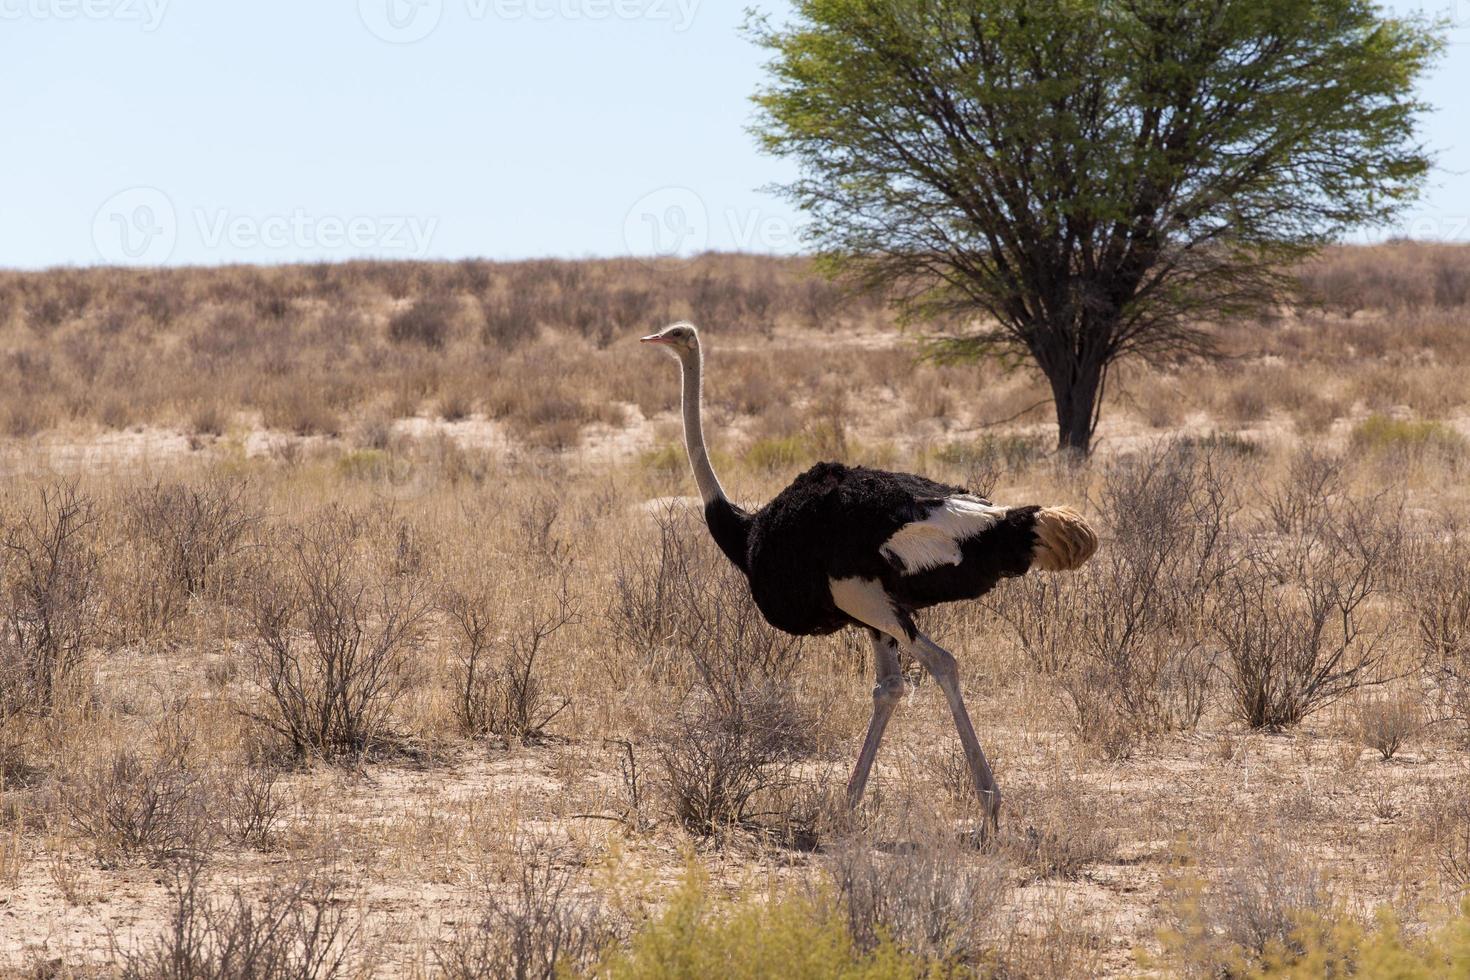 avestruz struthio camelus, en kgalagadi, sudáfrica foto